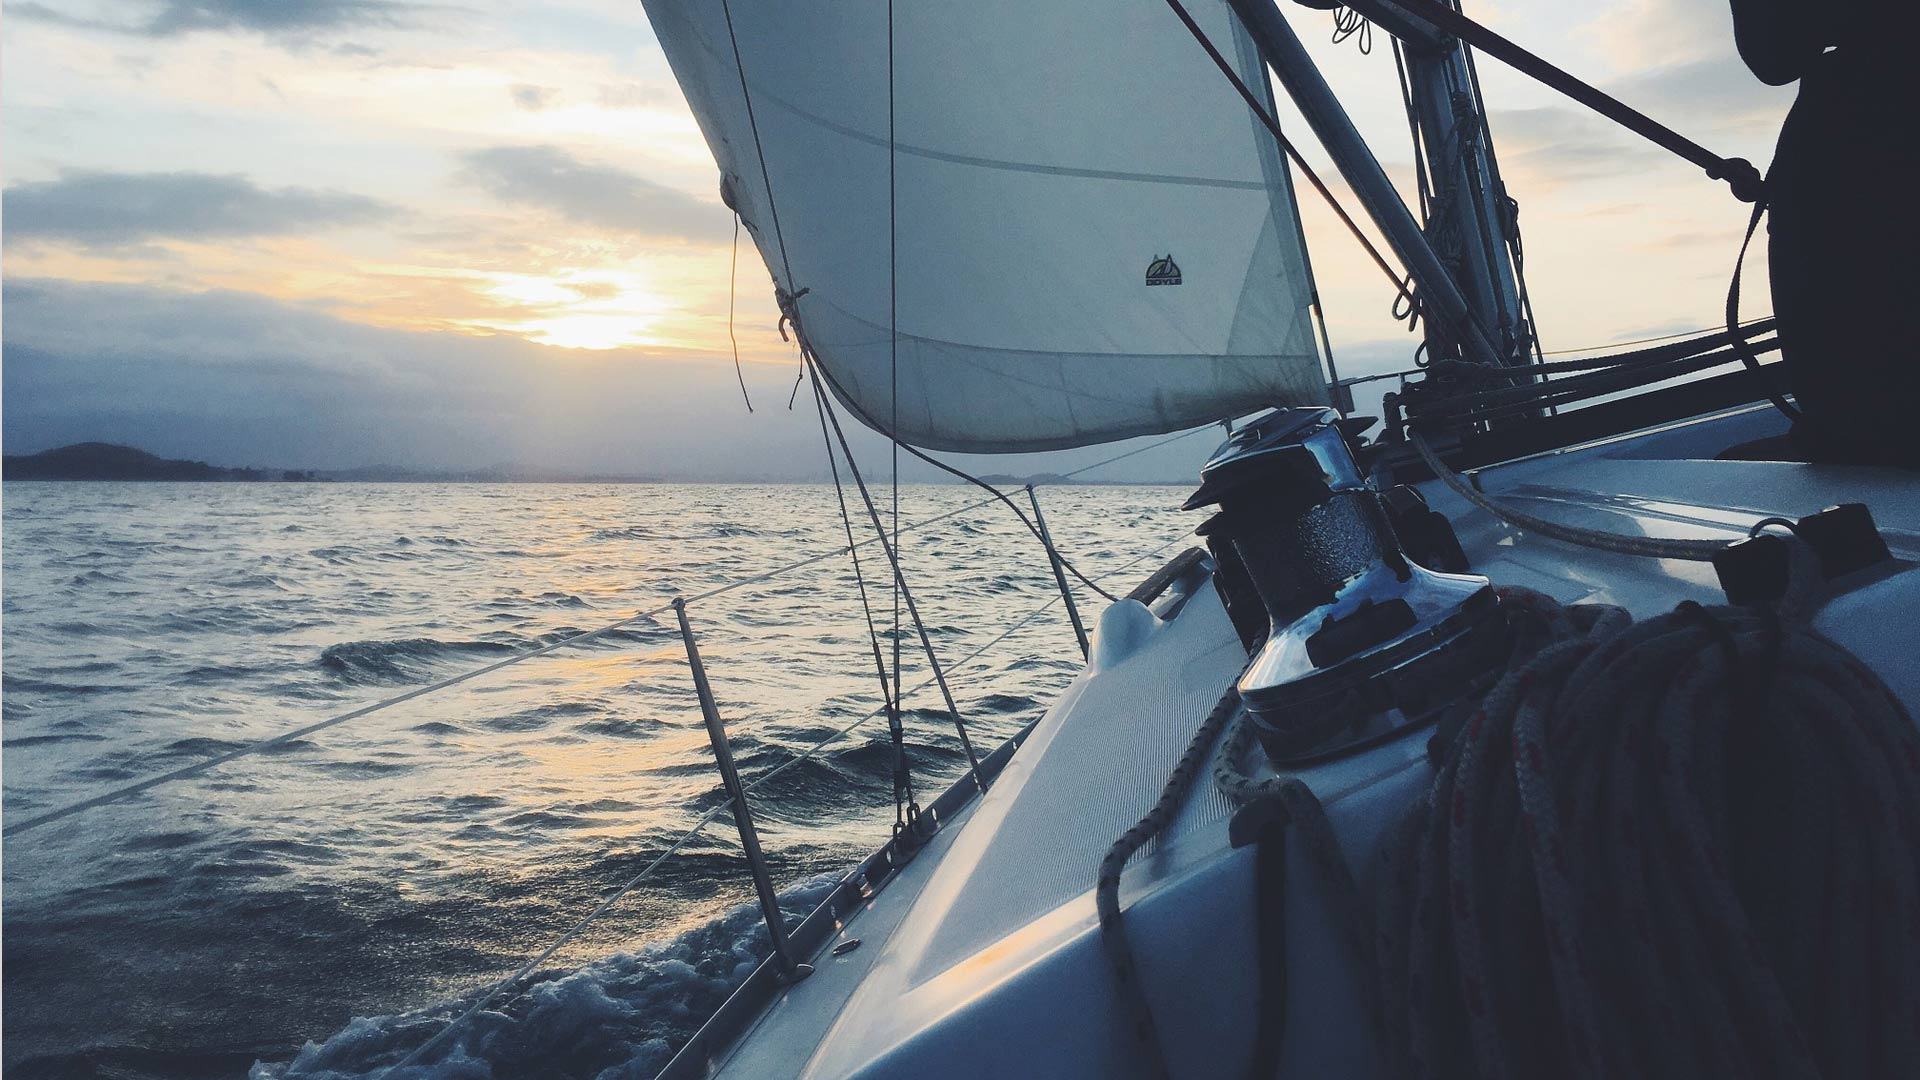 benefici vacanza in barca